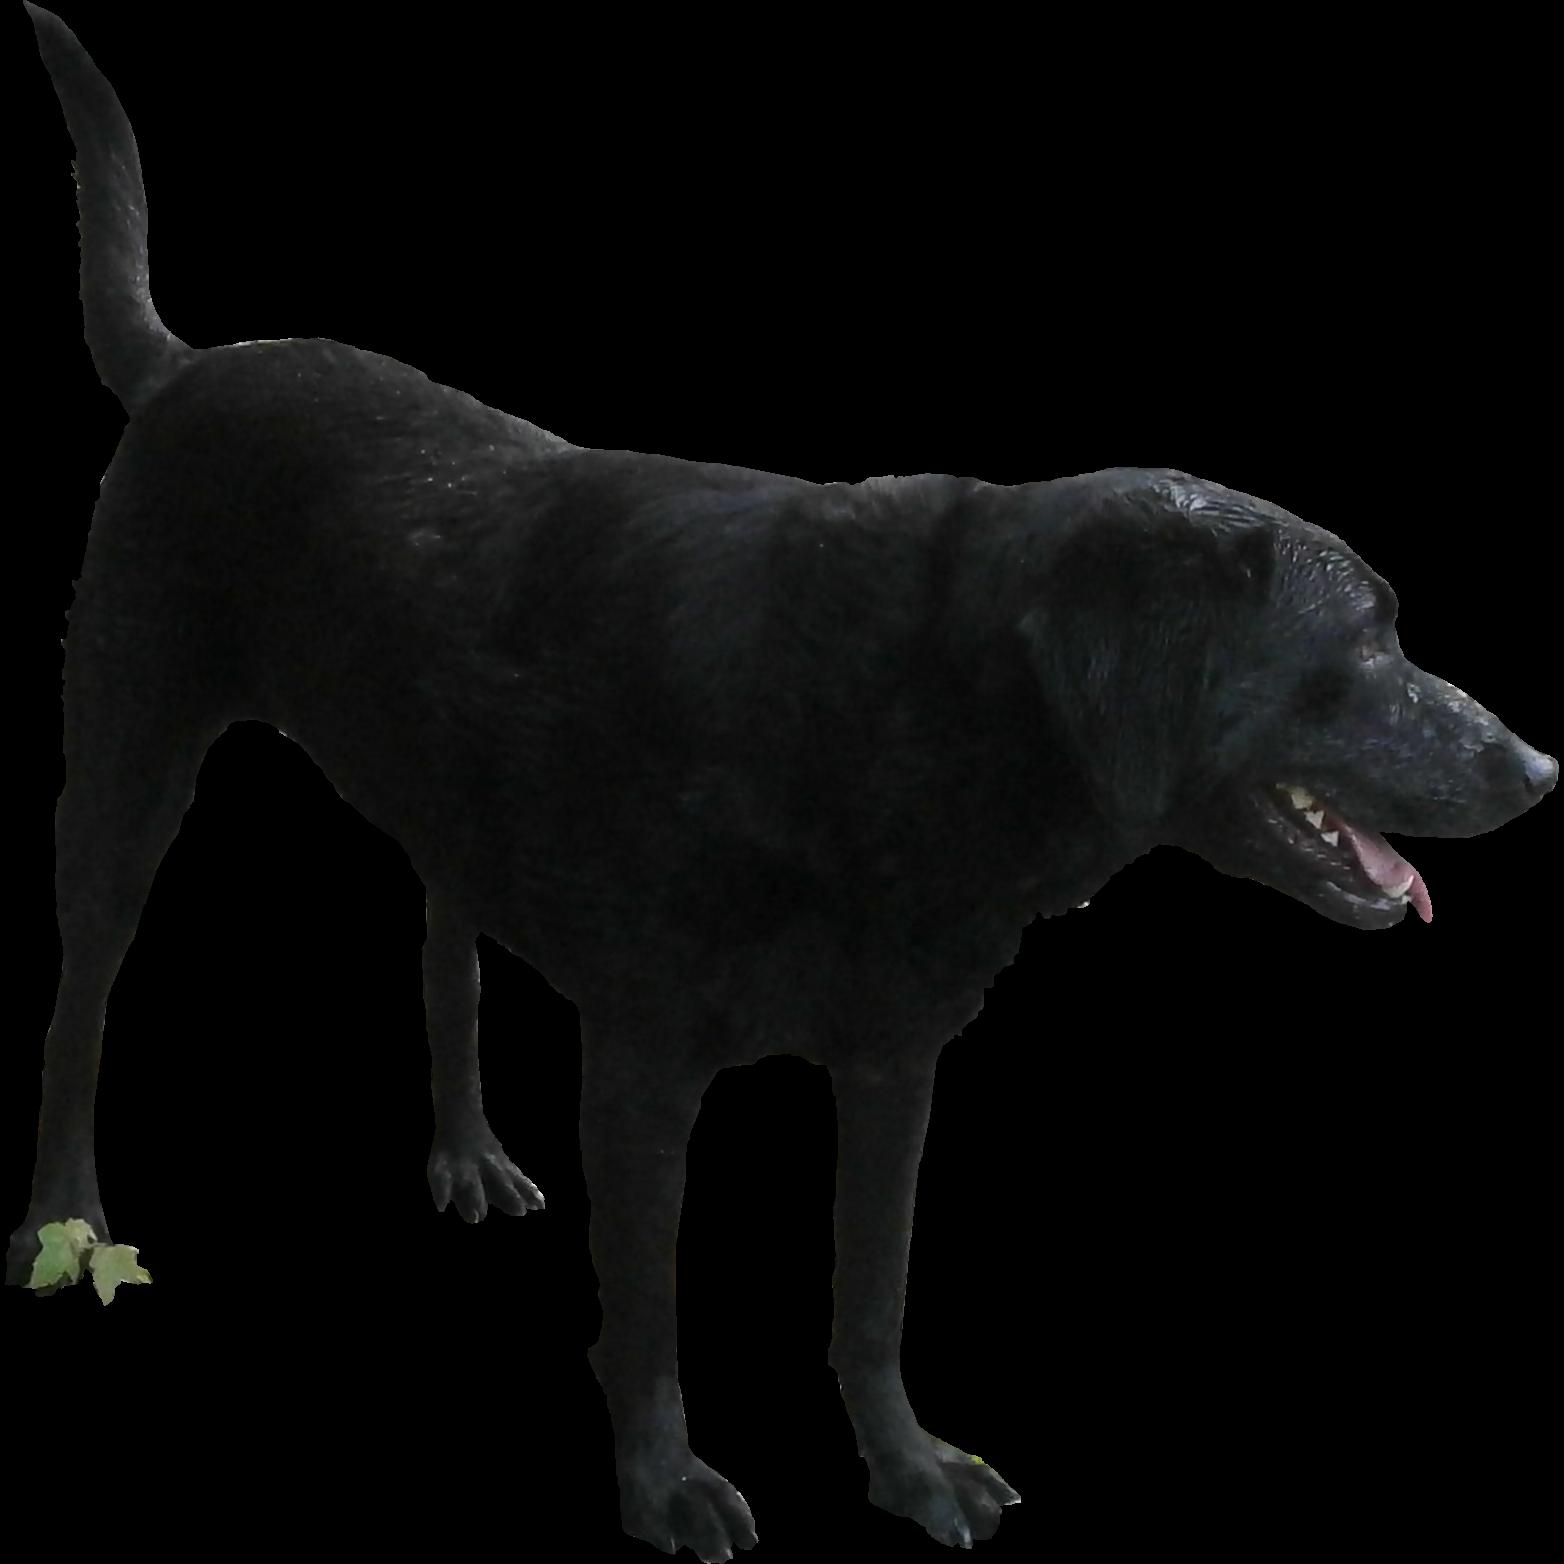 Black Labrador Free Cutout Black Labrador Animals Images Photoshop Images